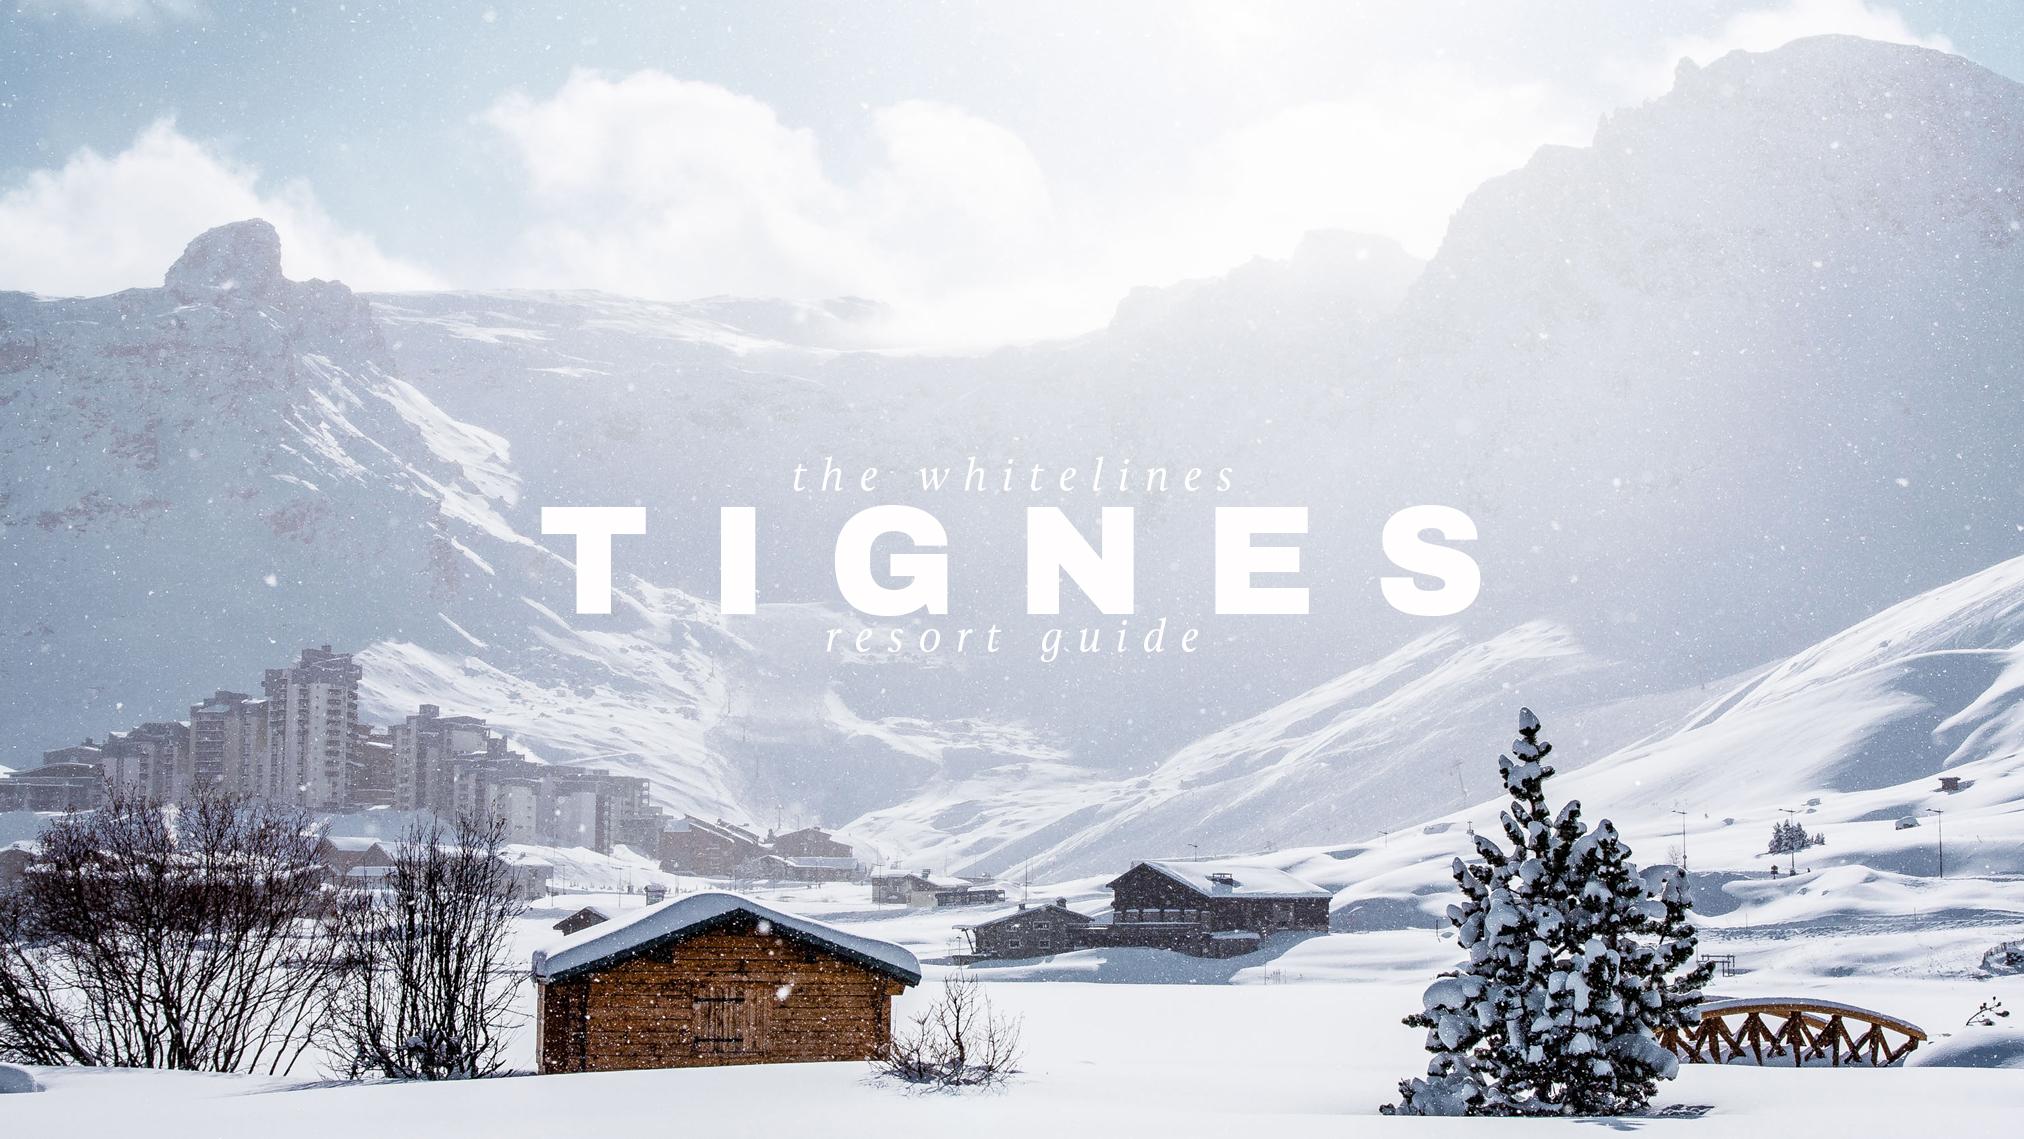 Ski Resorts Guide   Tignes France   Whitelines Snow 2024x1139